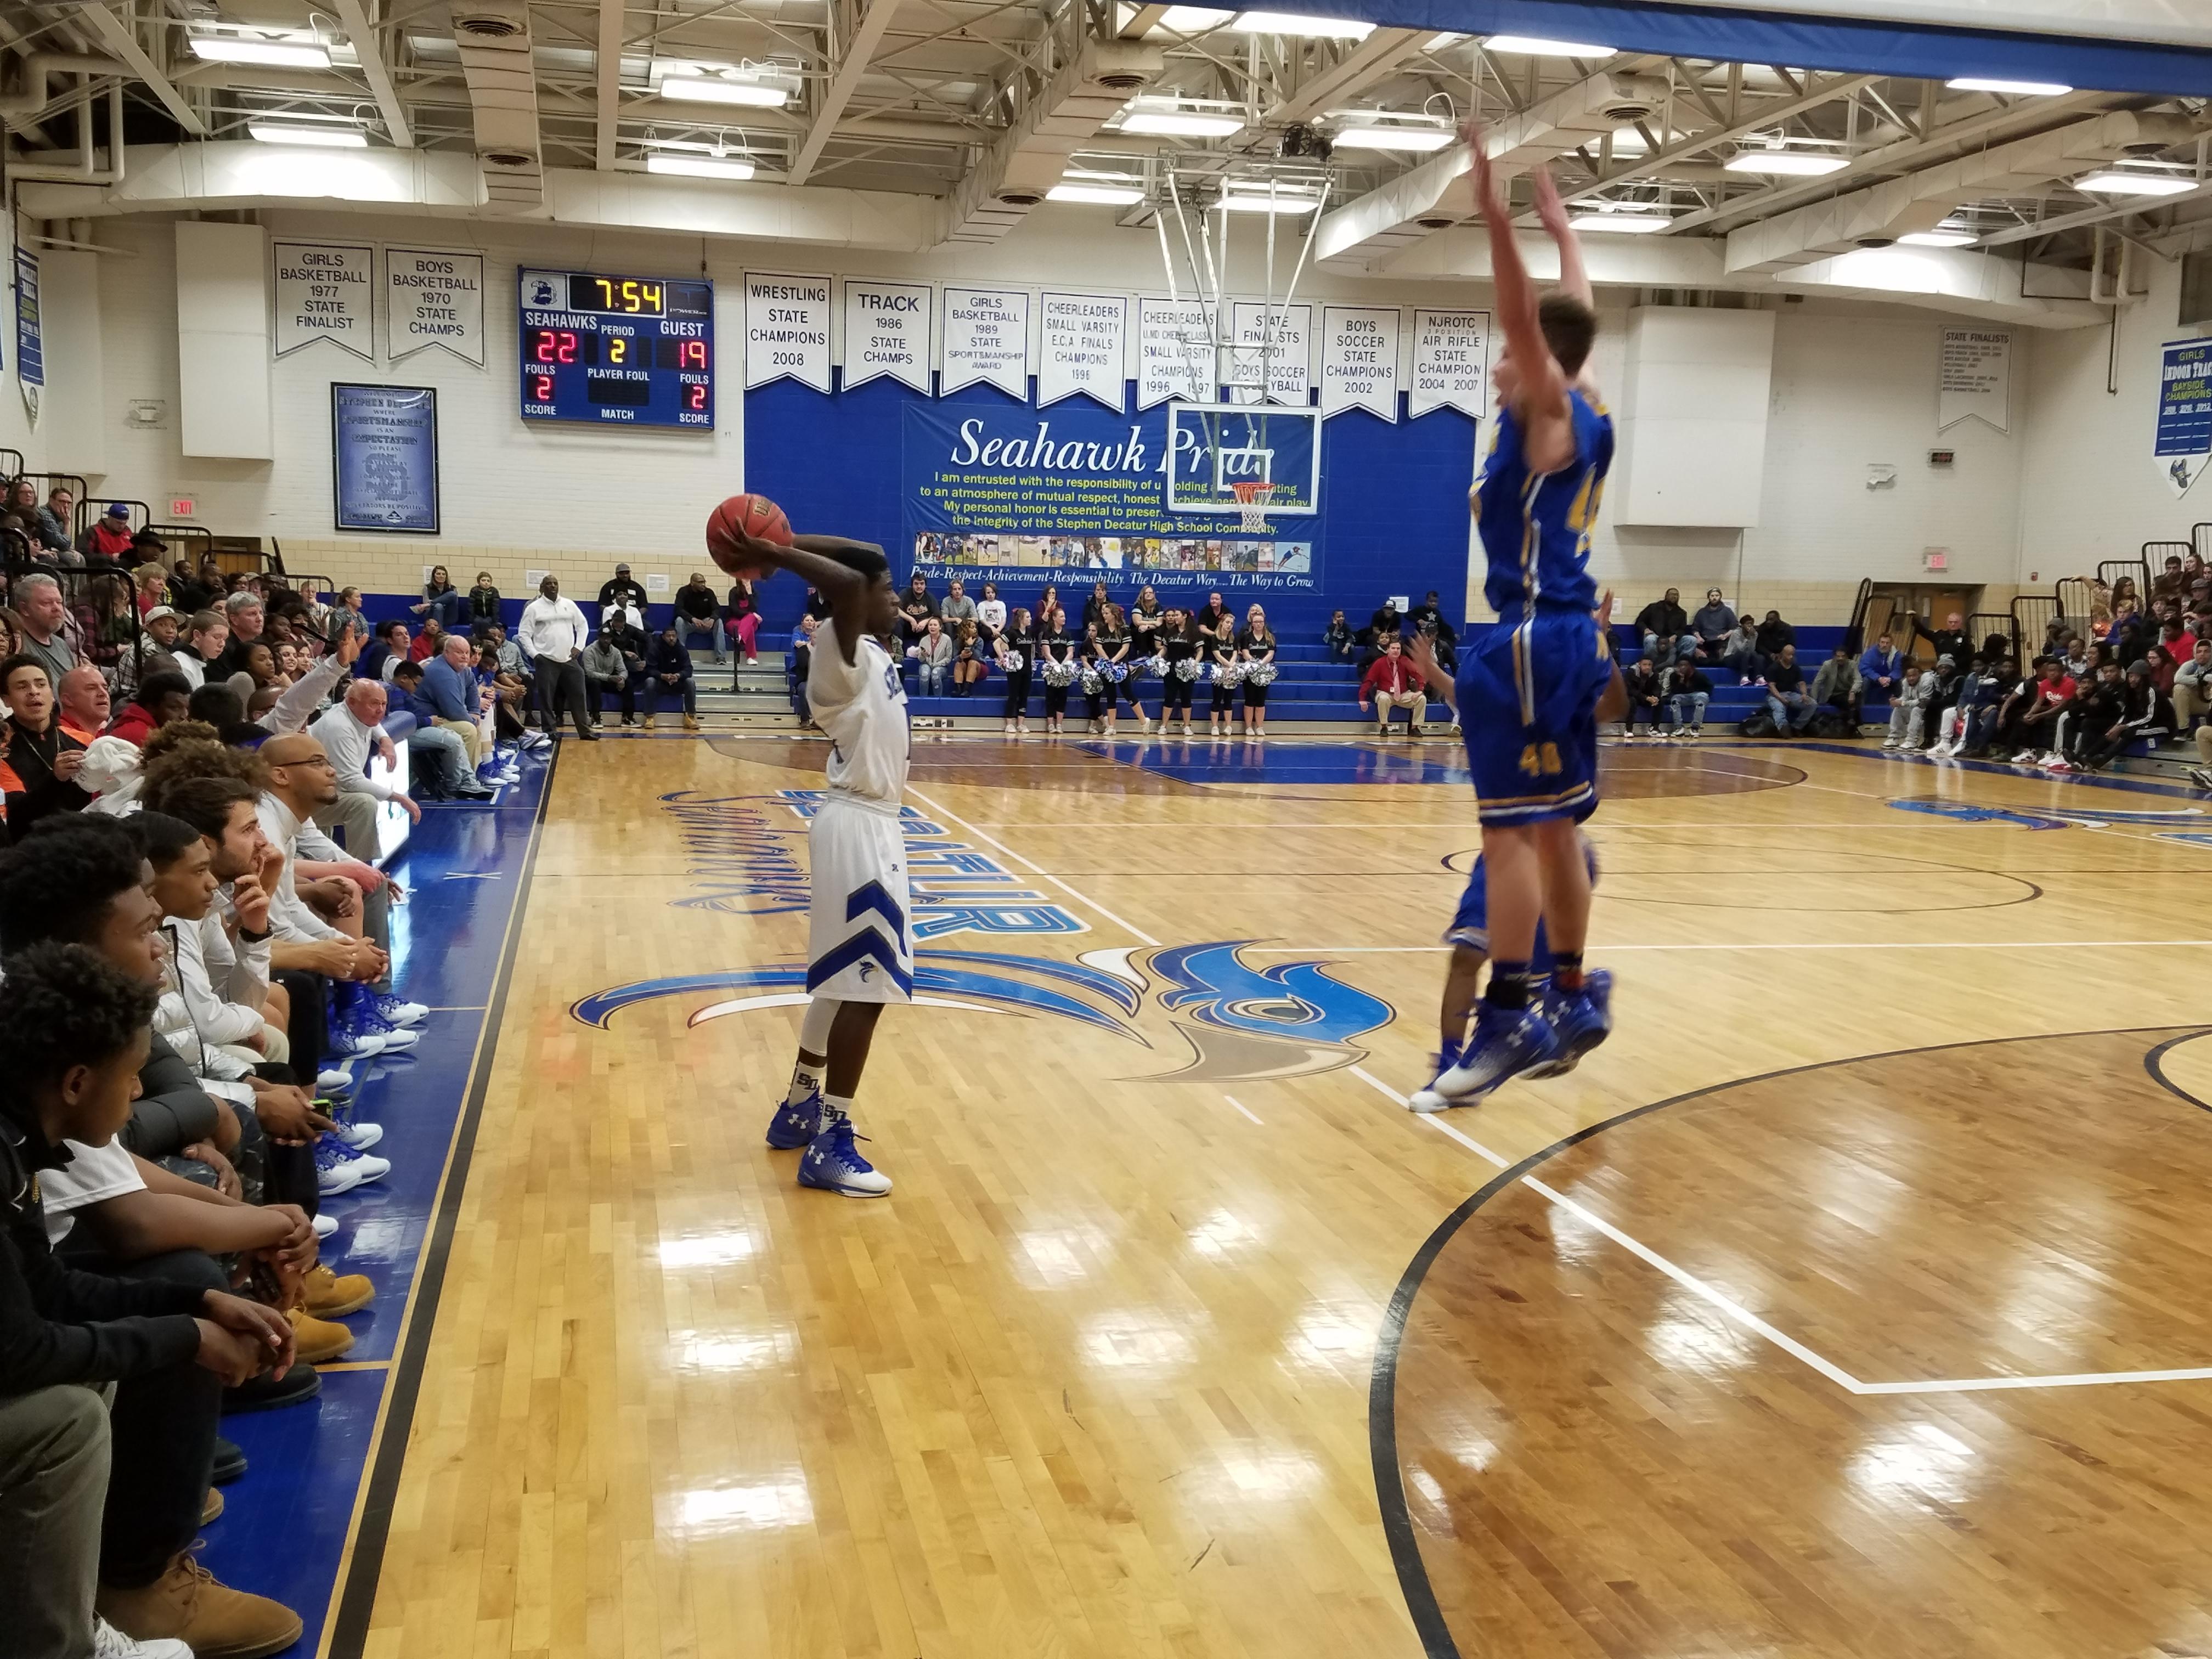 High School Basketball Scoreboard – Tuesday February 14, 2017